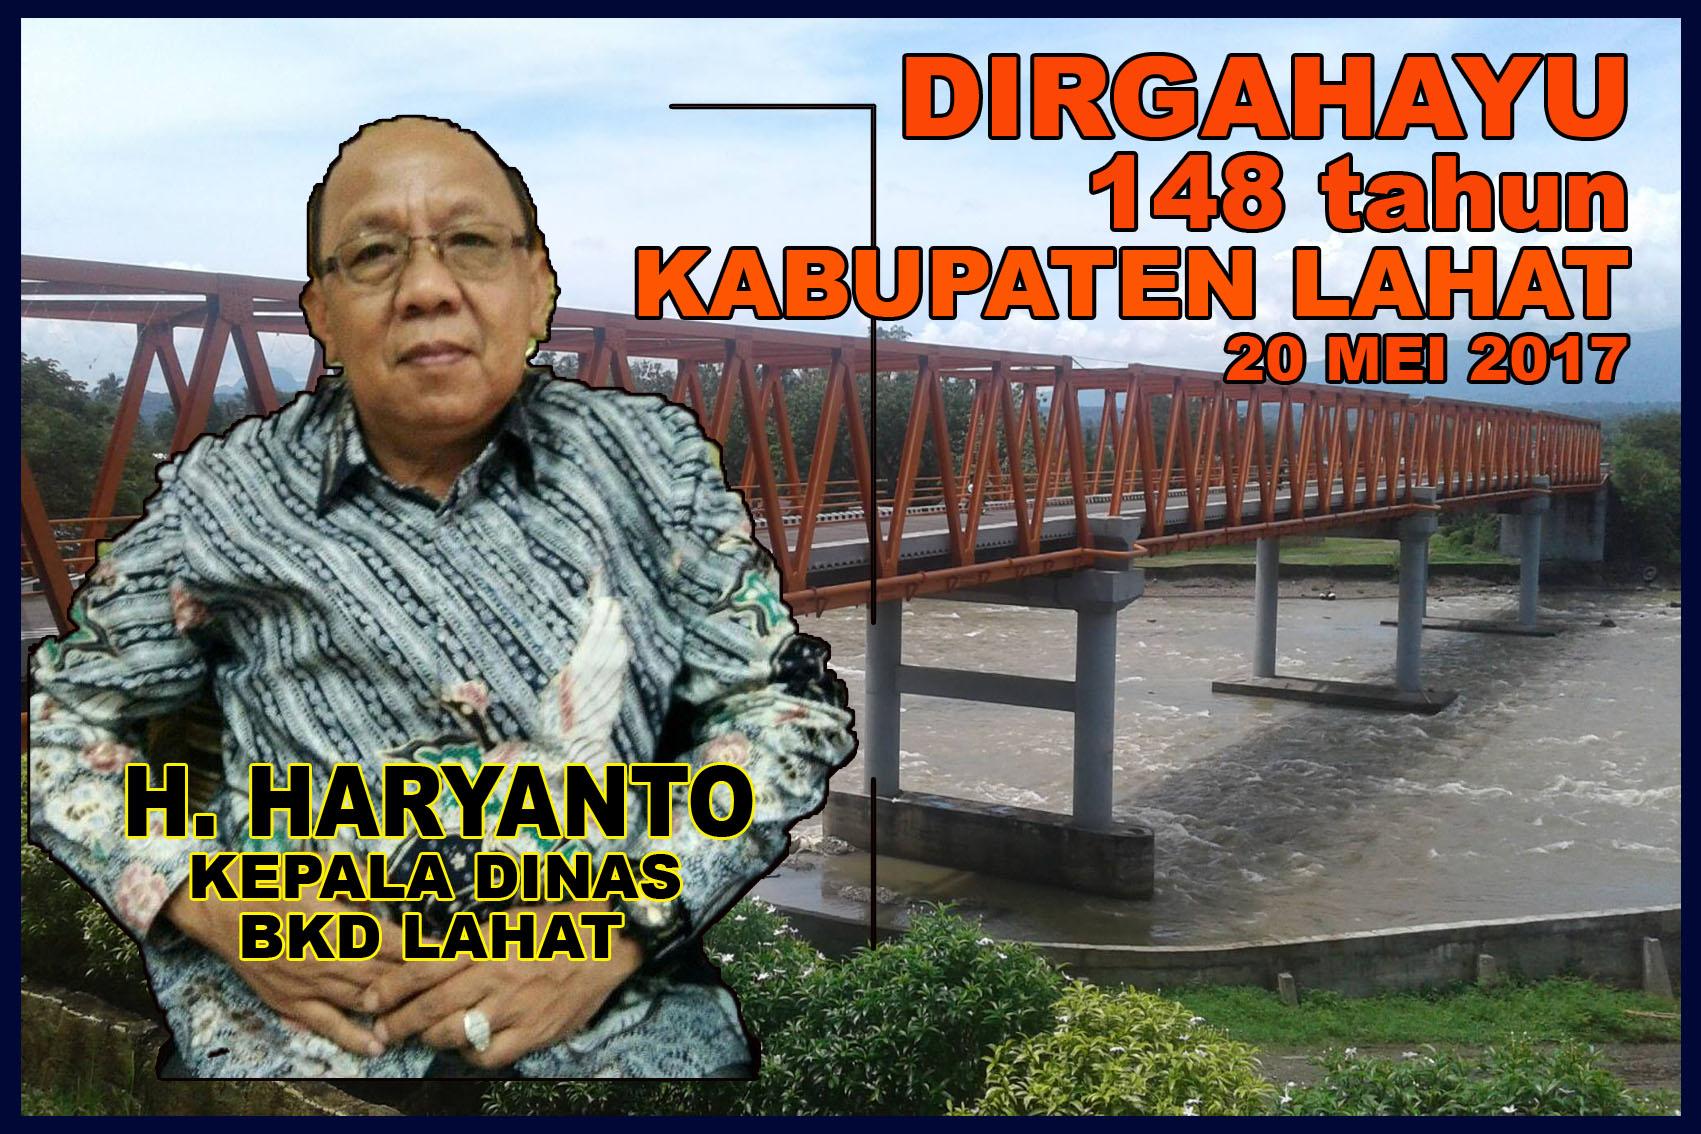 HARYANTO BKD 148